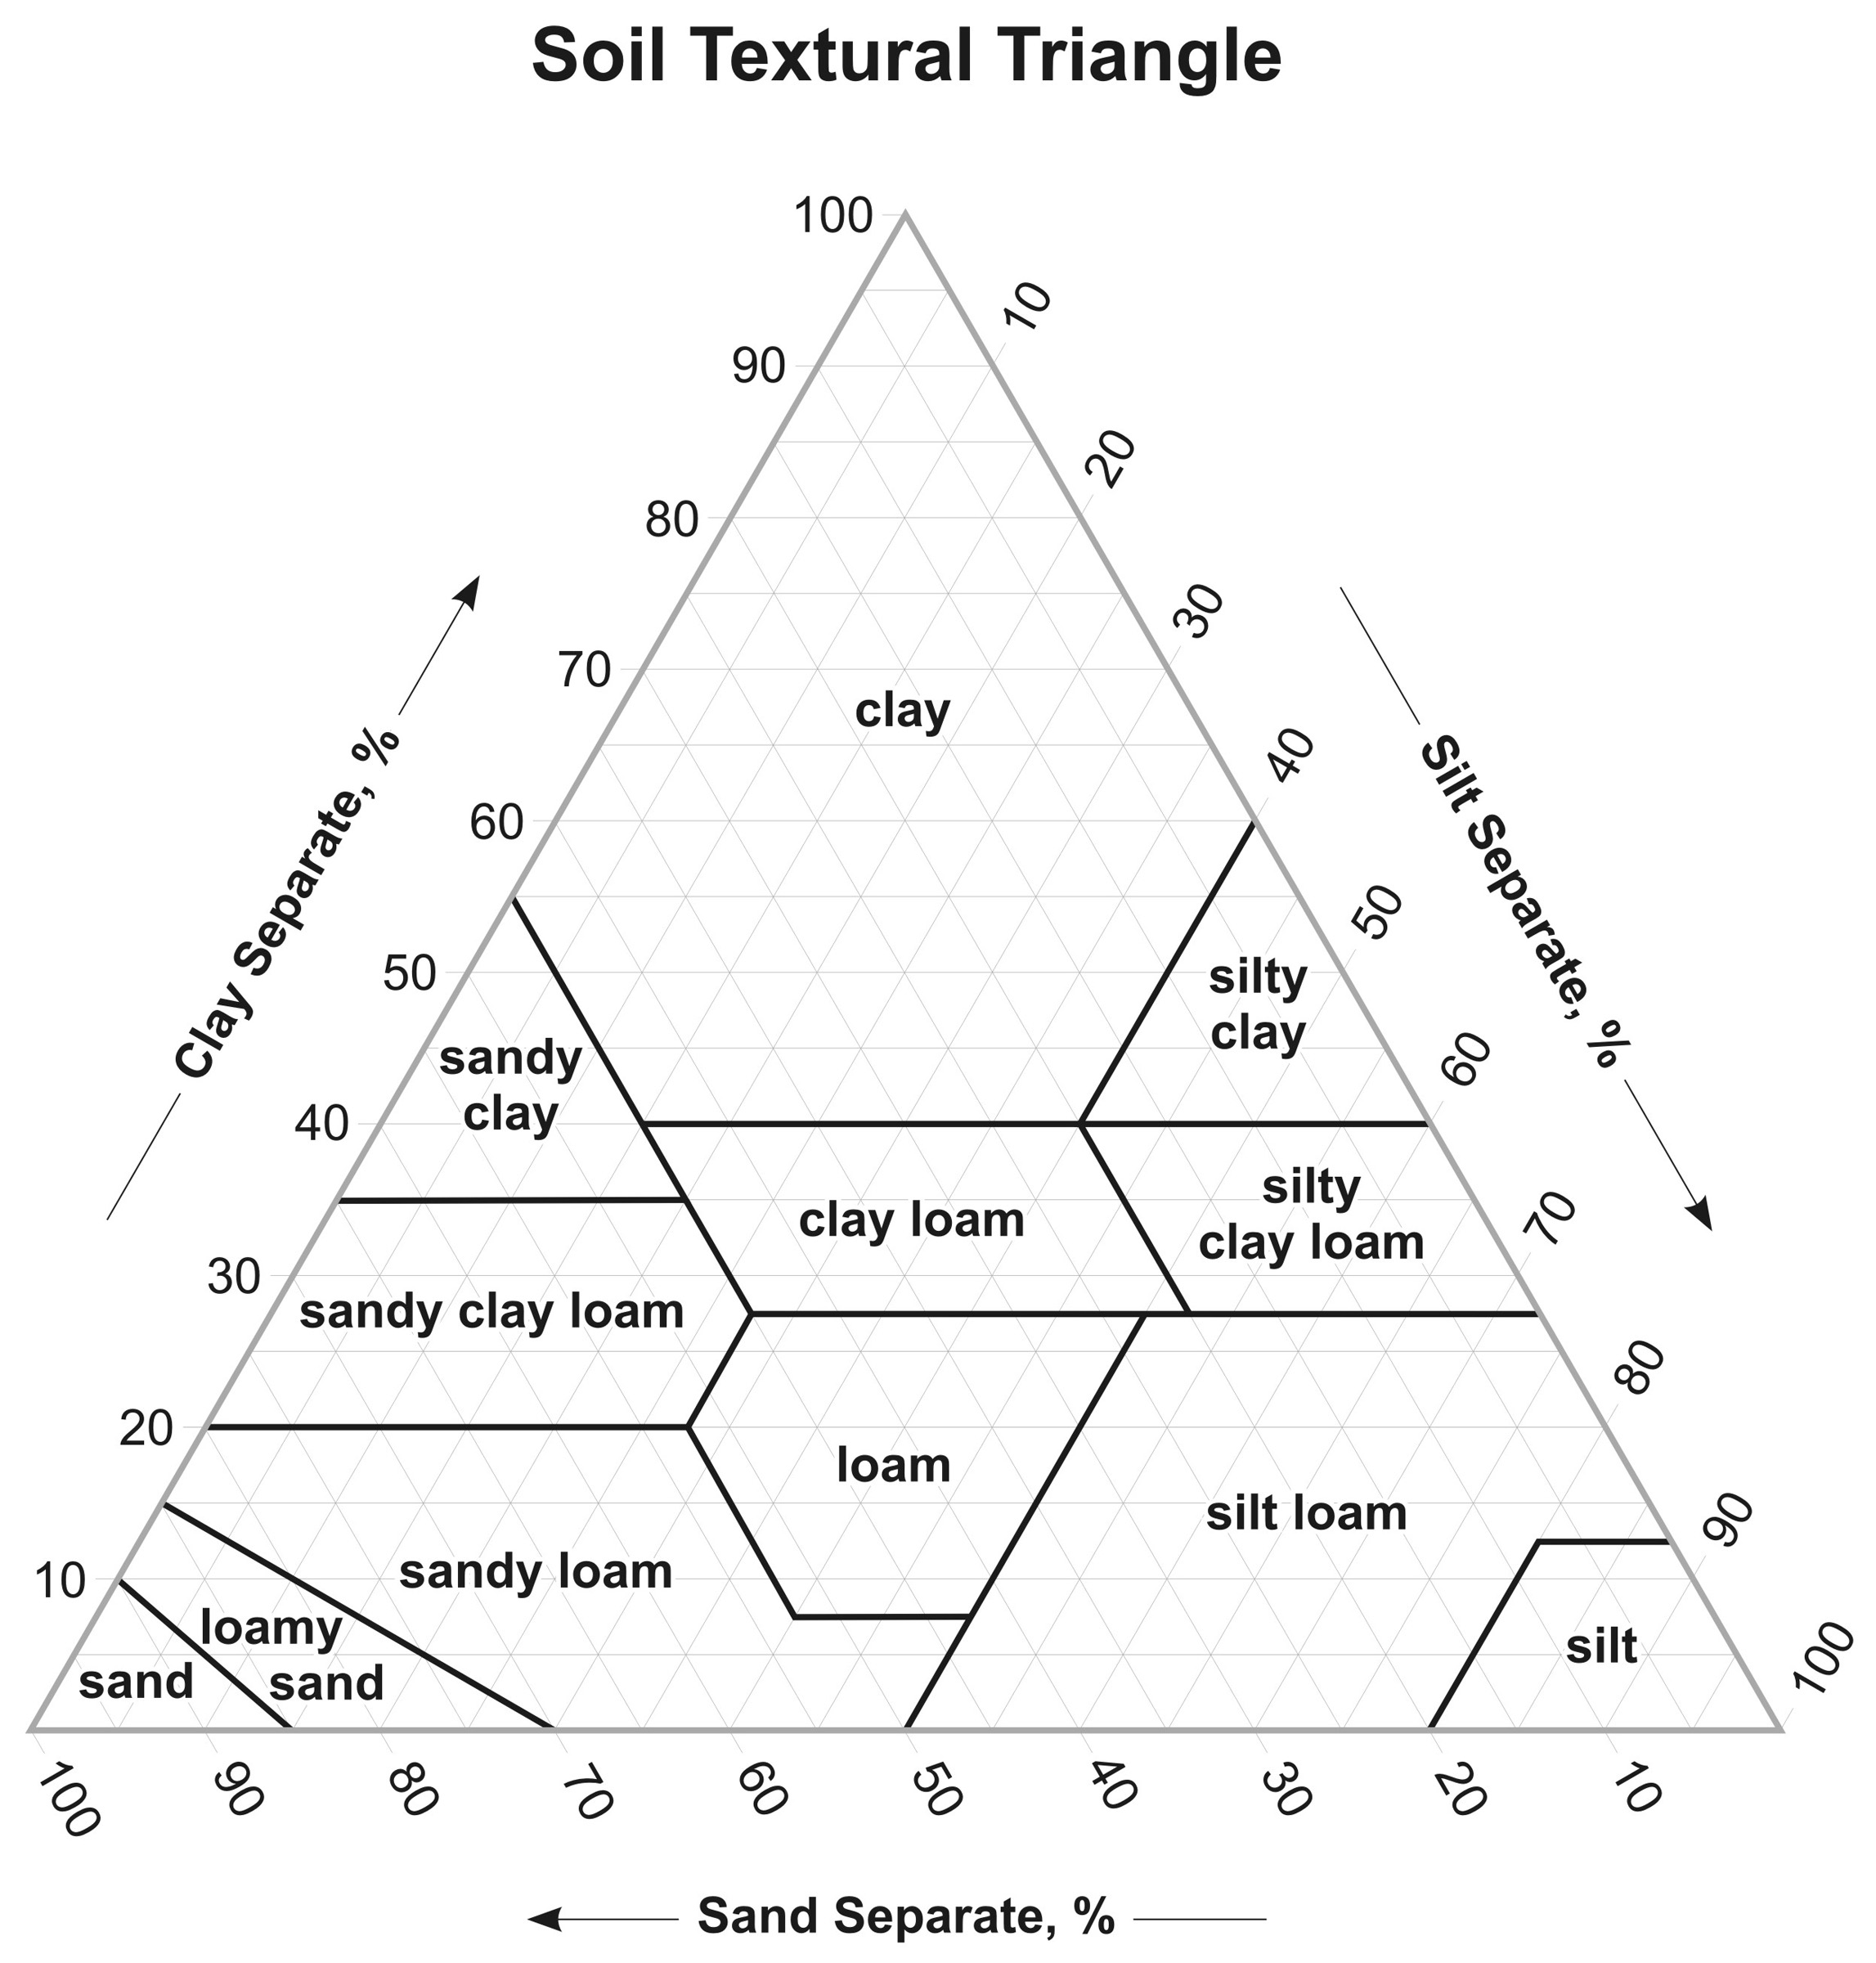 Texture Soilhub